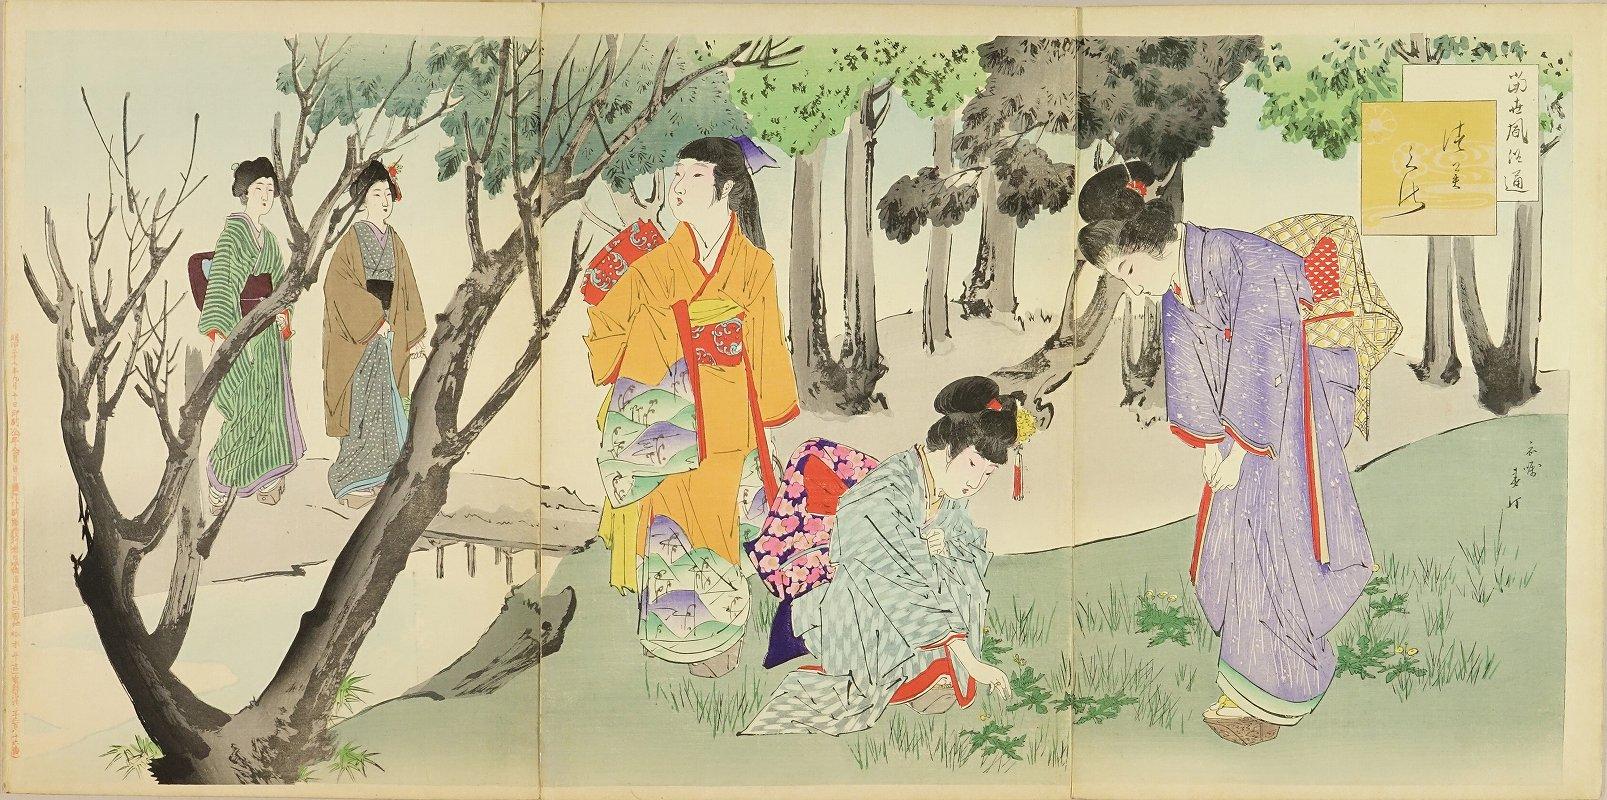 SHUNTEI <i>Tsumikusa</i> (Picking edible grass), from <i>Tosei fuzoku tsu</i> (Daily life of the day), triptych